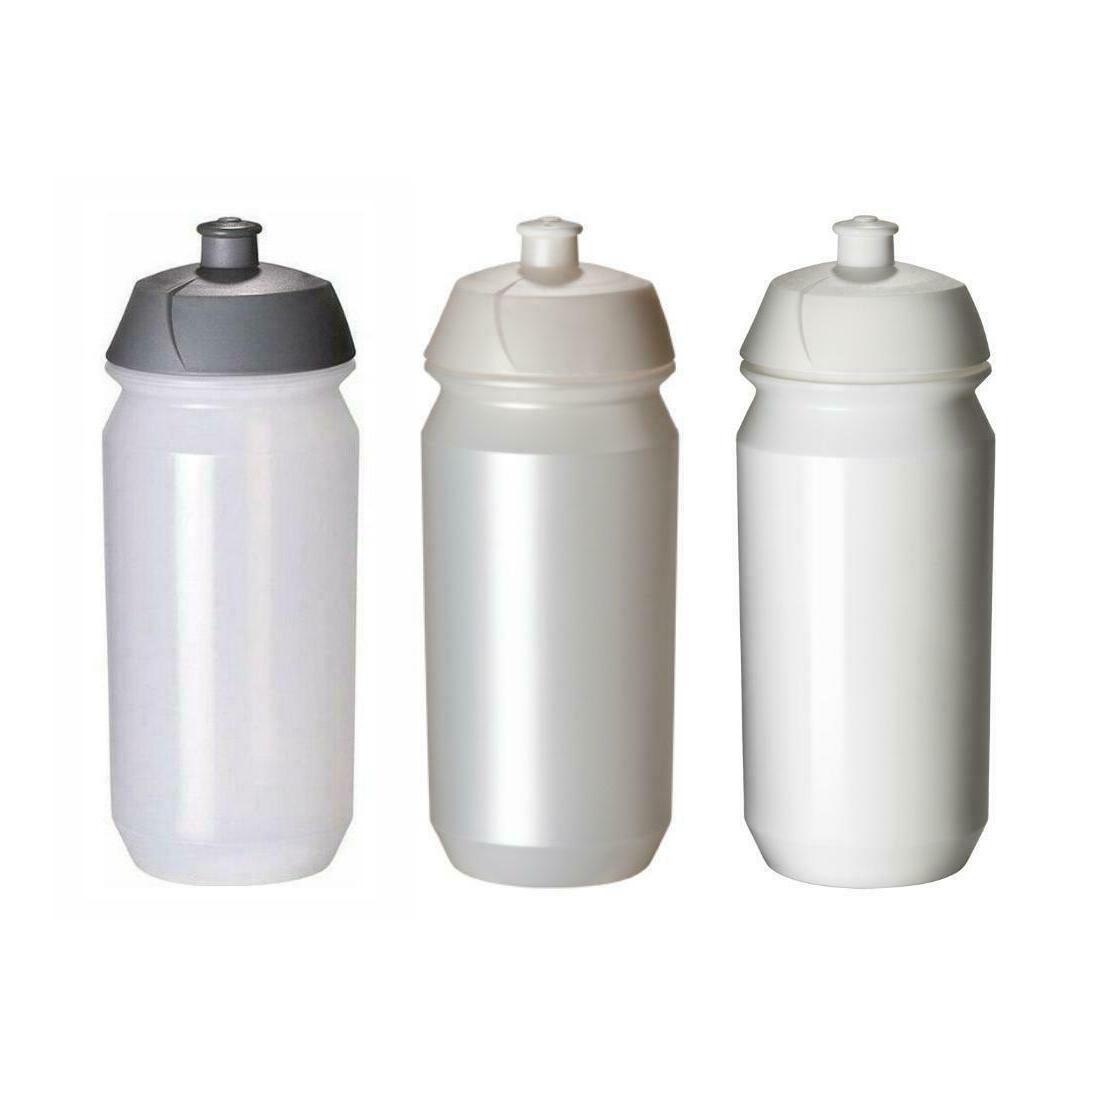 Tacx Shiva Water Bottles